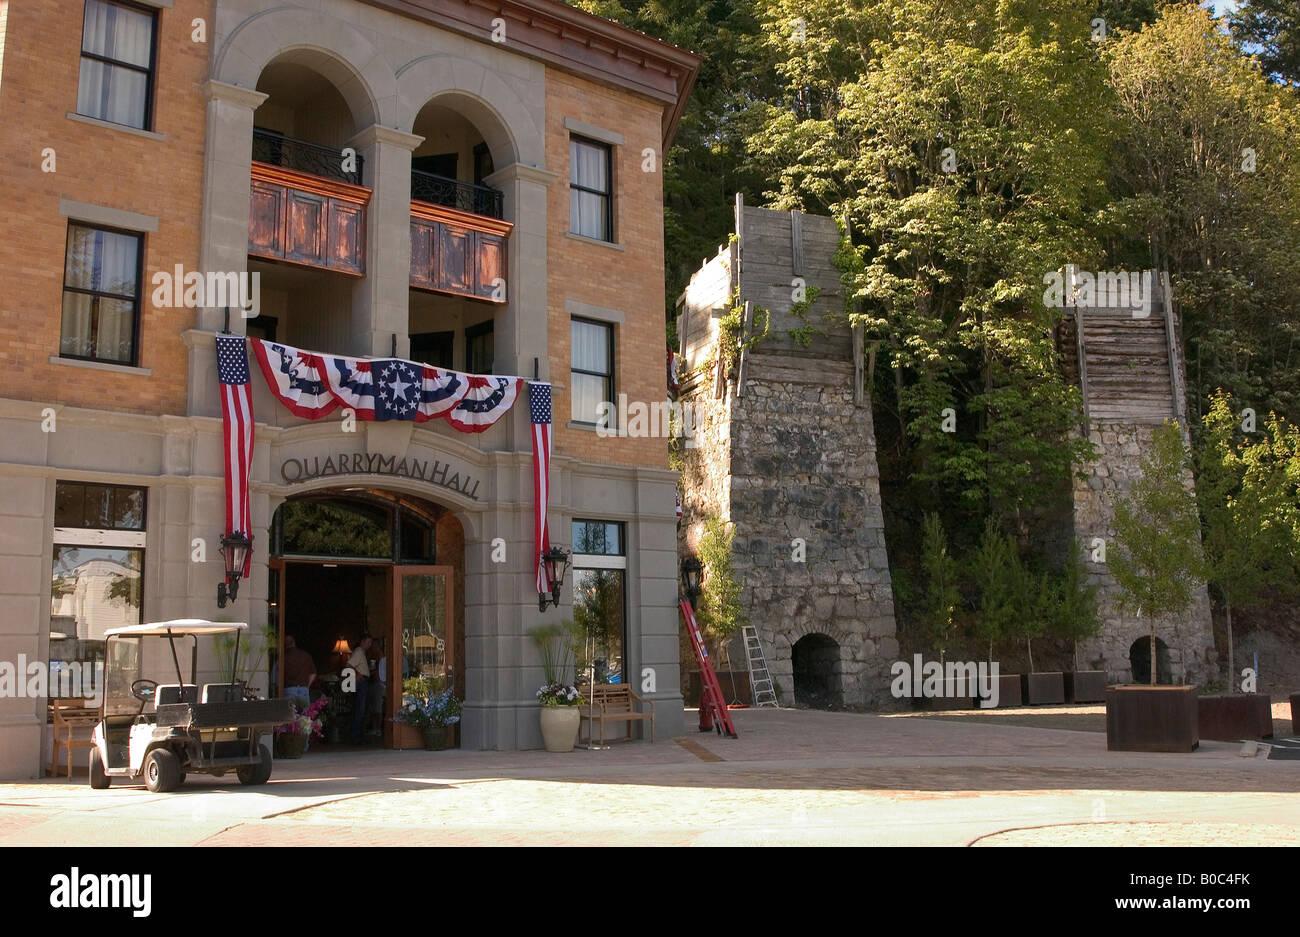 USA, Washington State, San Juan Islands, Roche Harbor, Quarryman Hall store and spa, with historic lime kilns. - Stock Image